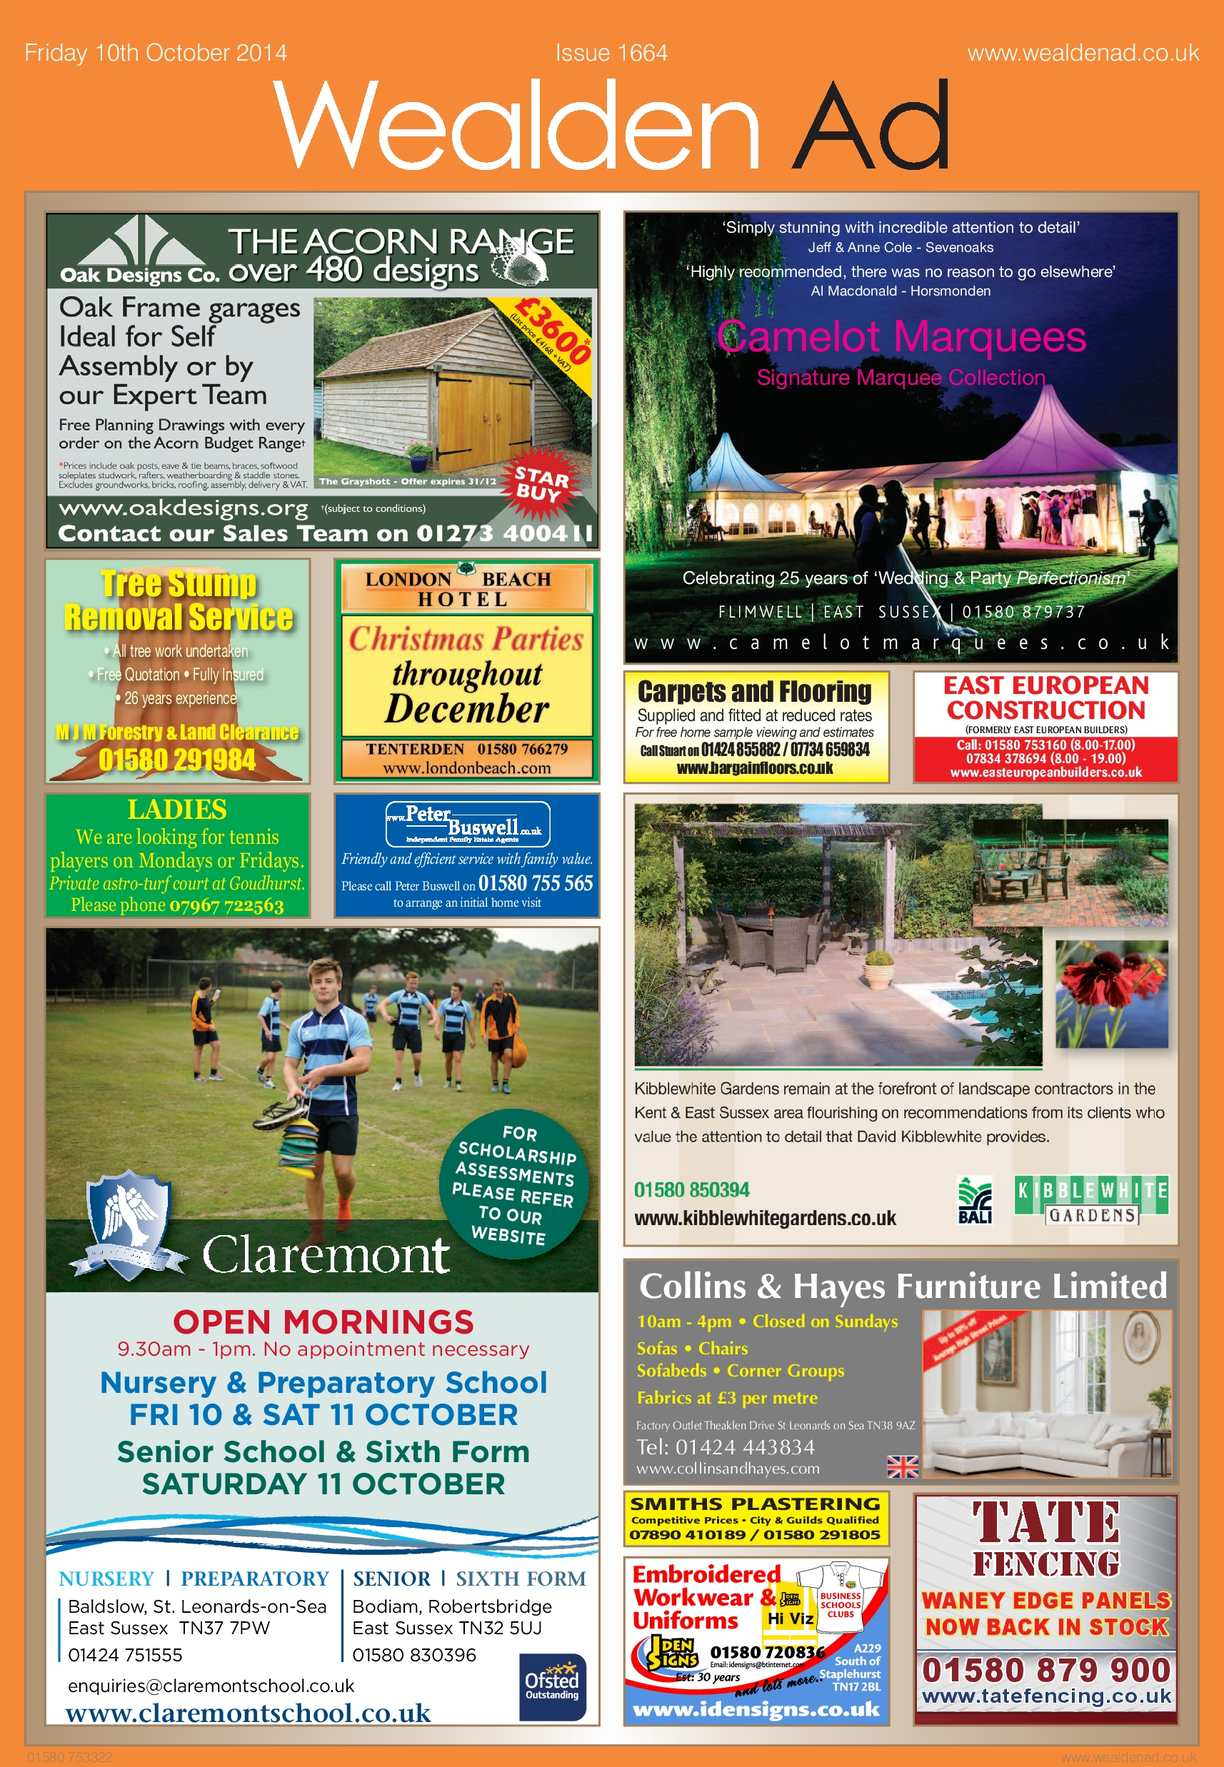 Calaméo Wealden Advertiser 10 10 2014